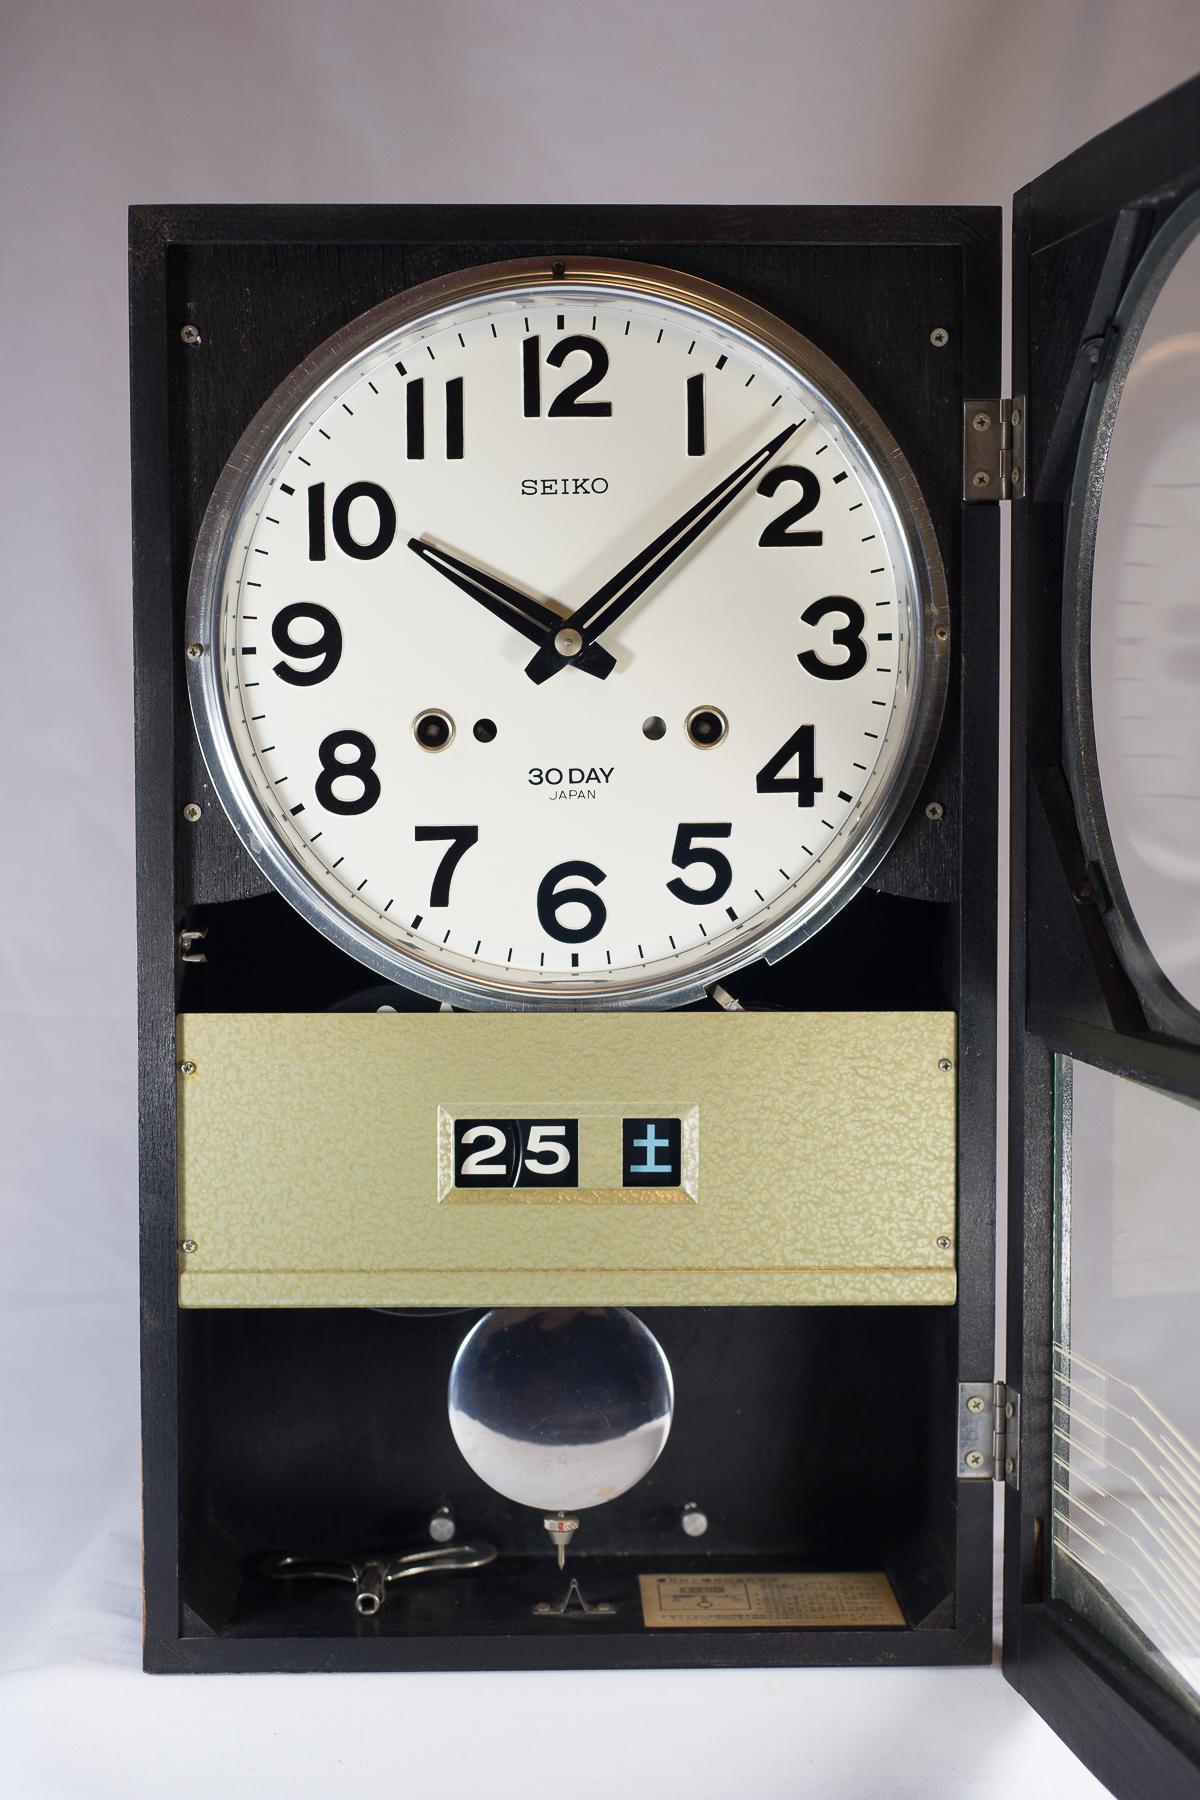 4PC436N Seiko 30 Day Clock